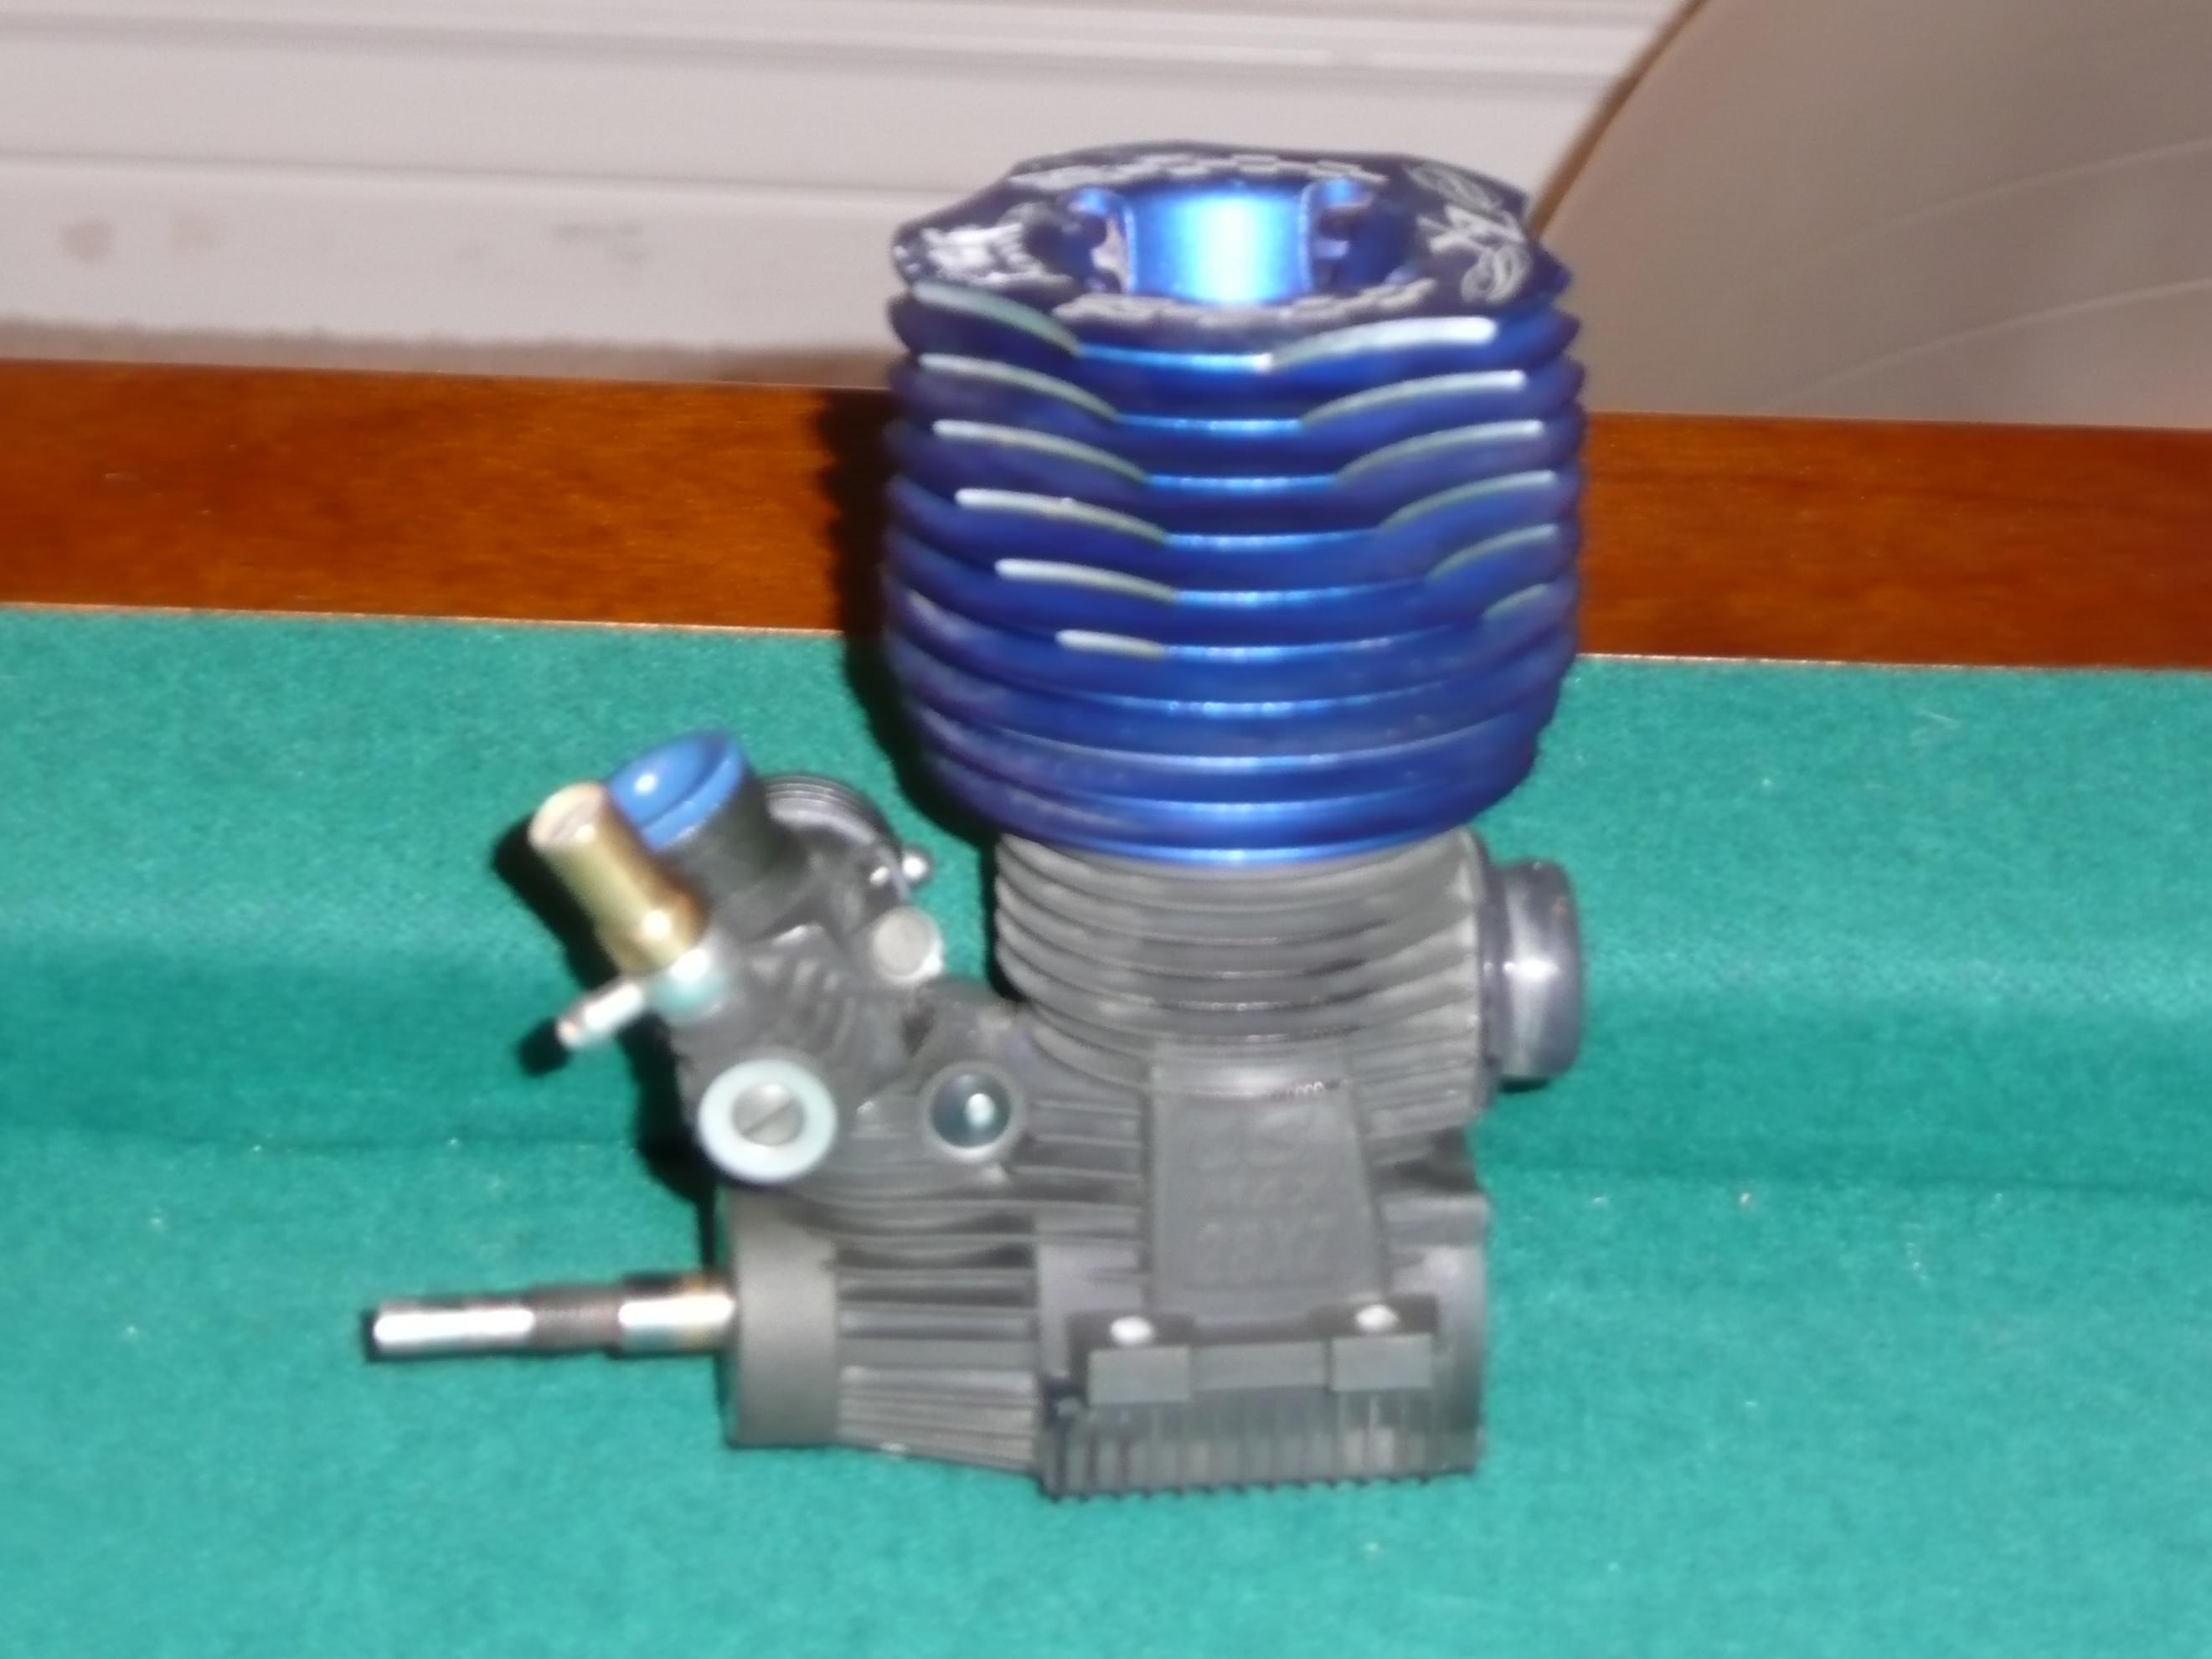 hpi savage 25 parts diagram 2007 jeep jk radio wiring x 4 6 engine get free image about